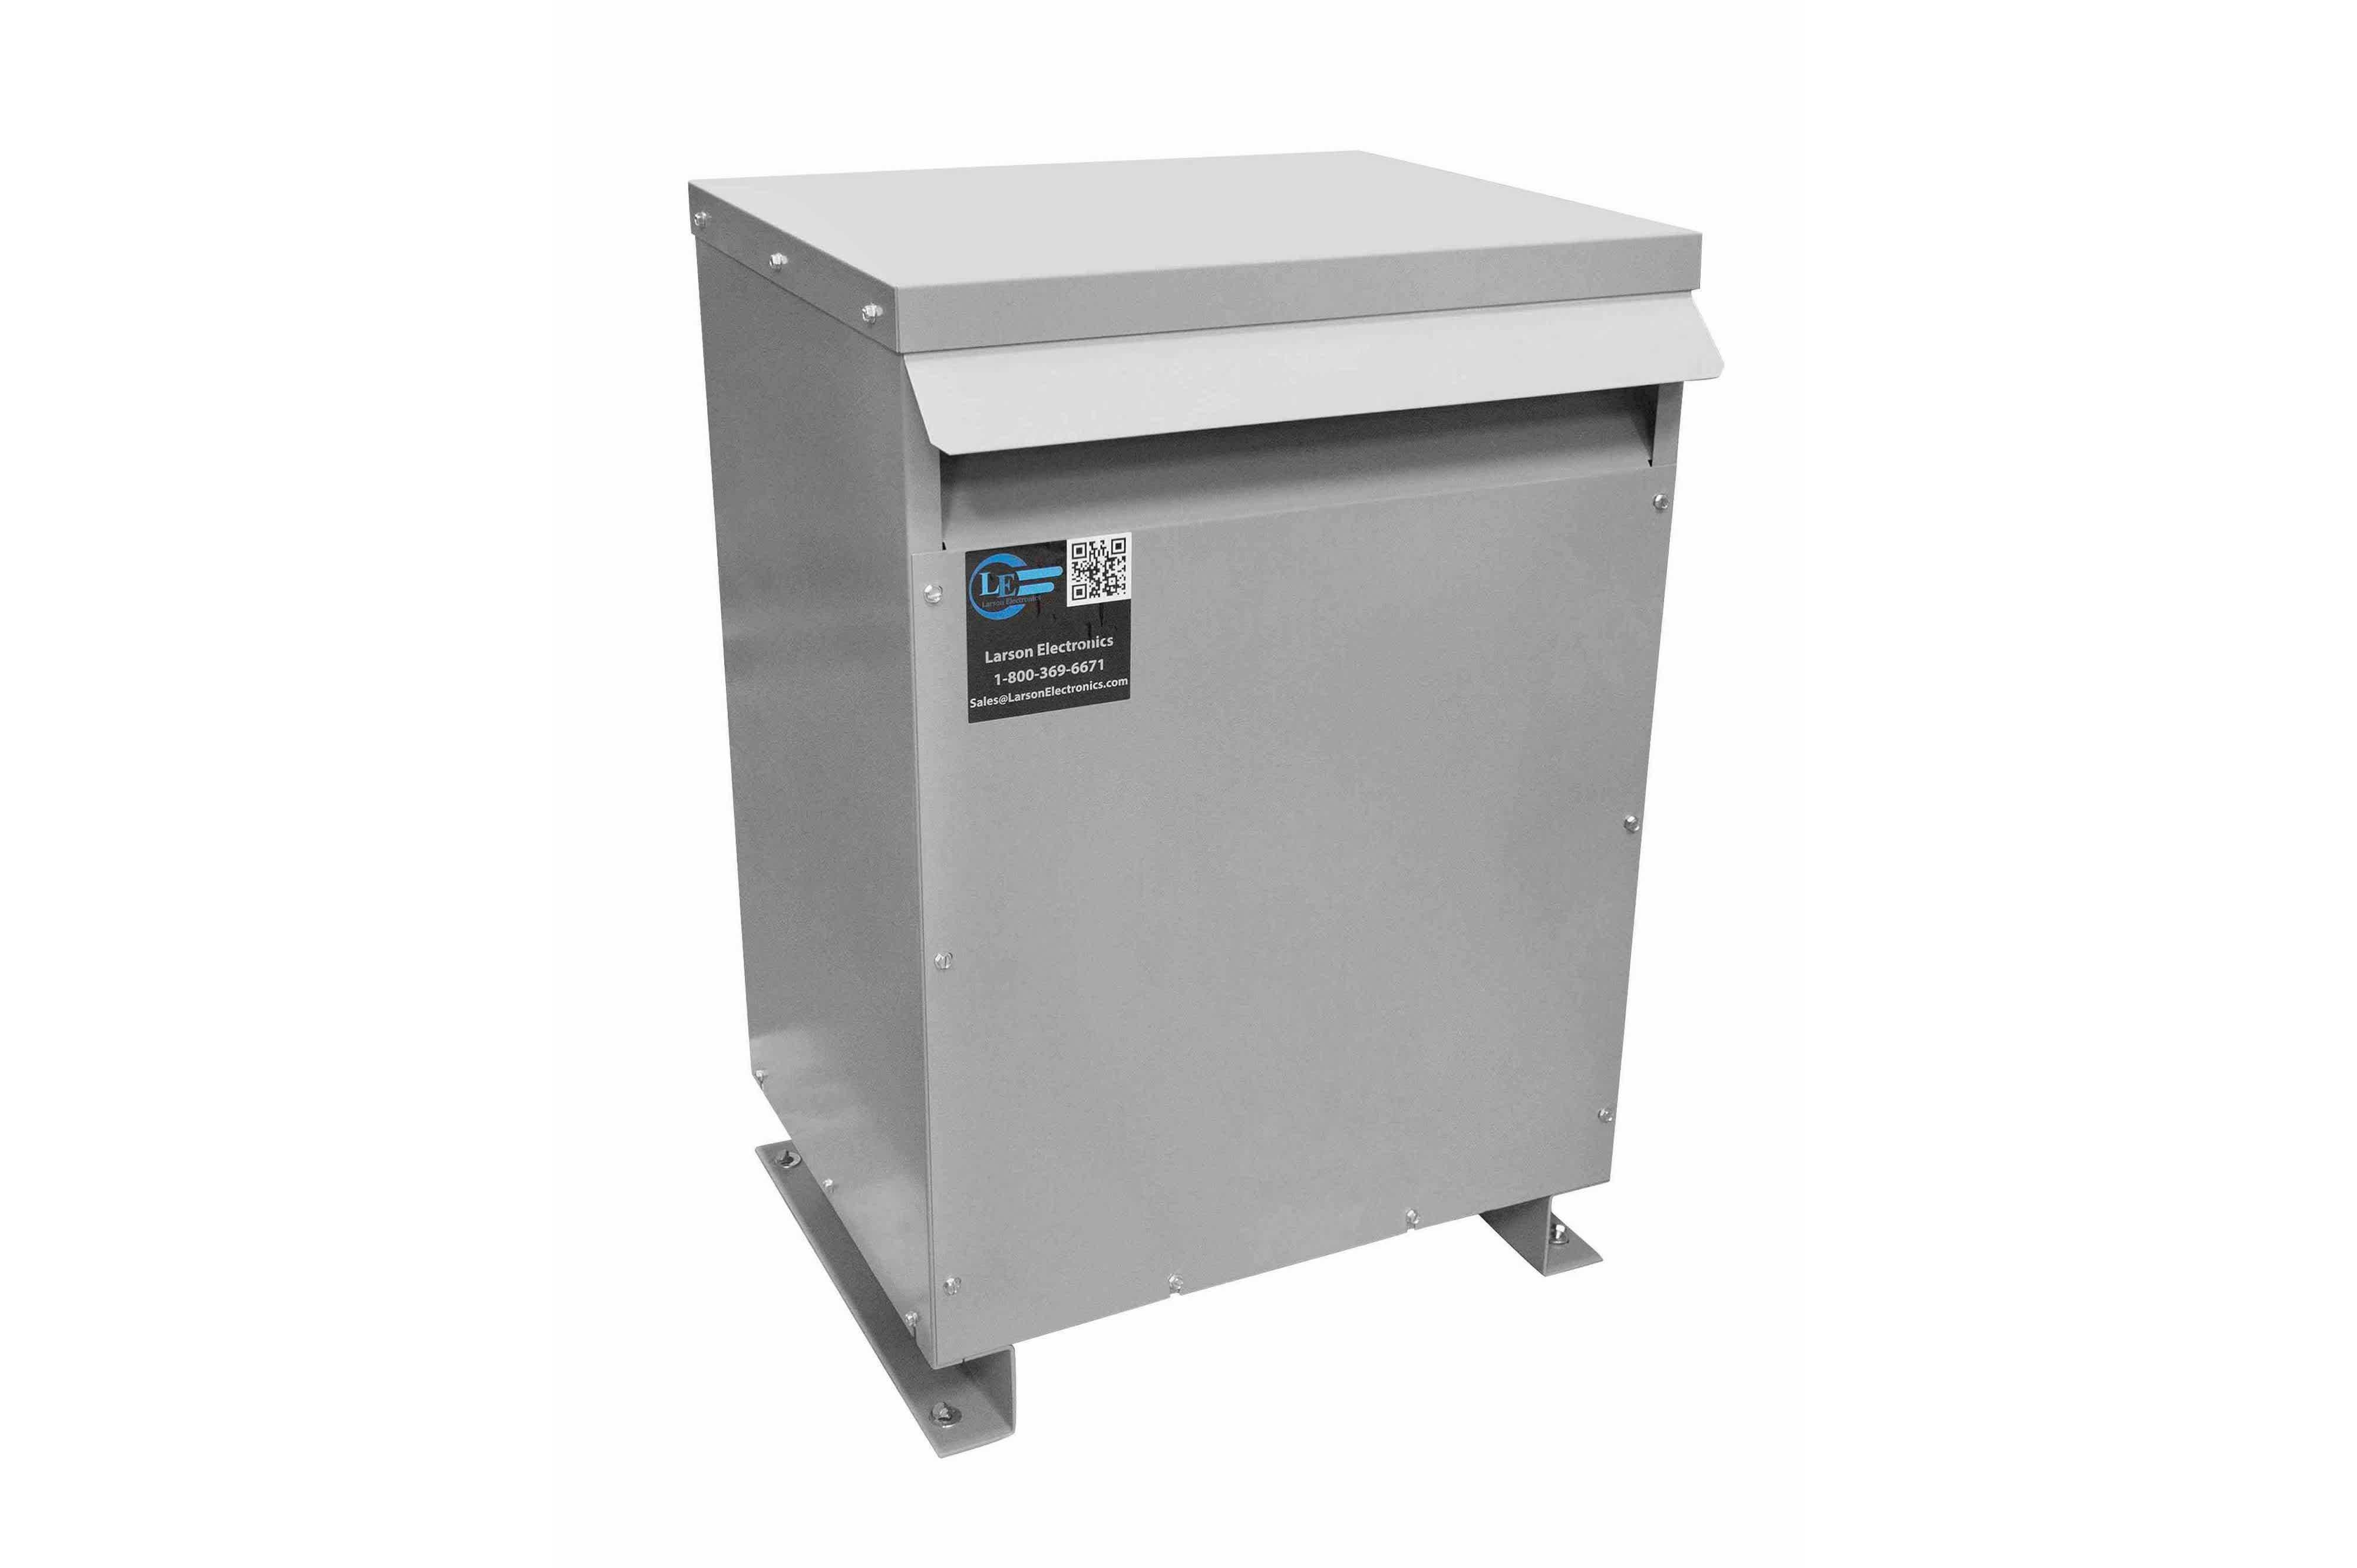 112.5 kVA 3PH Isolation Transformer, 380V Wye Primary, 600V Delta Secondary, N3R, Ventilated, 60 Hz